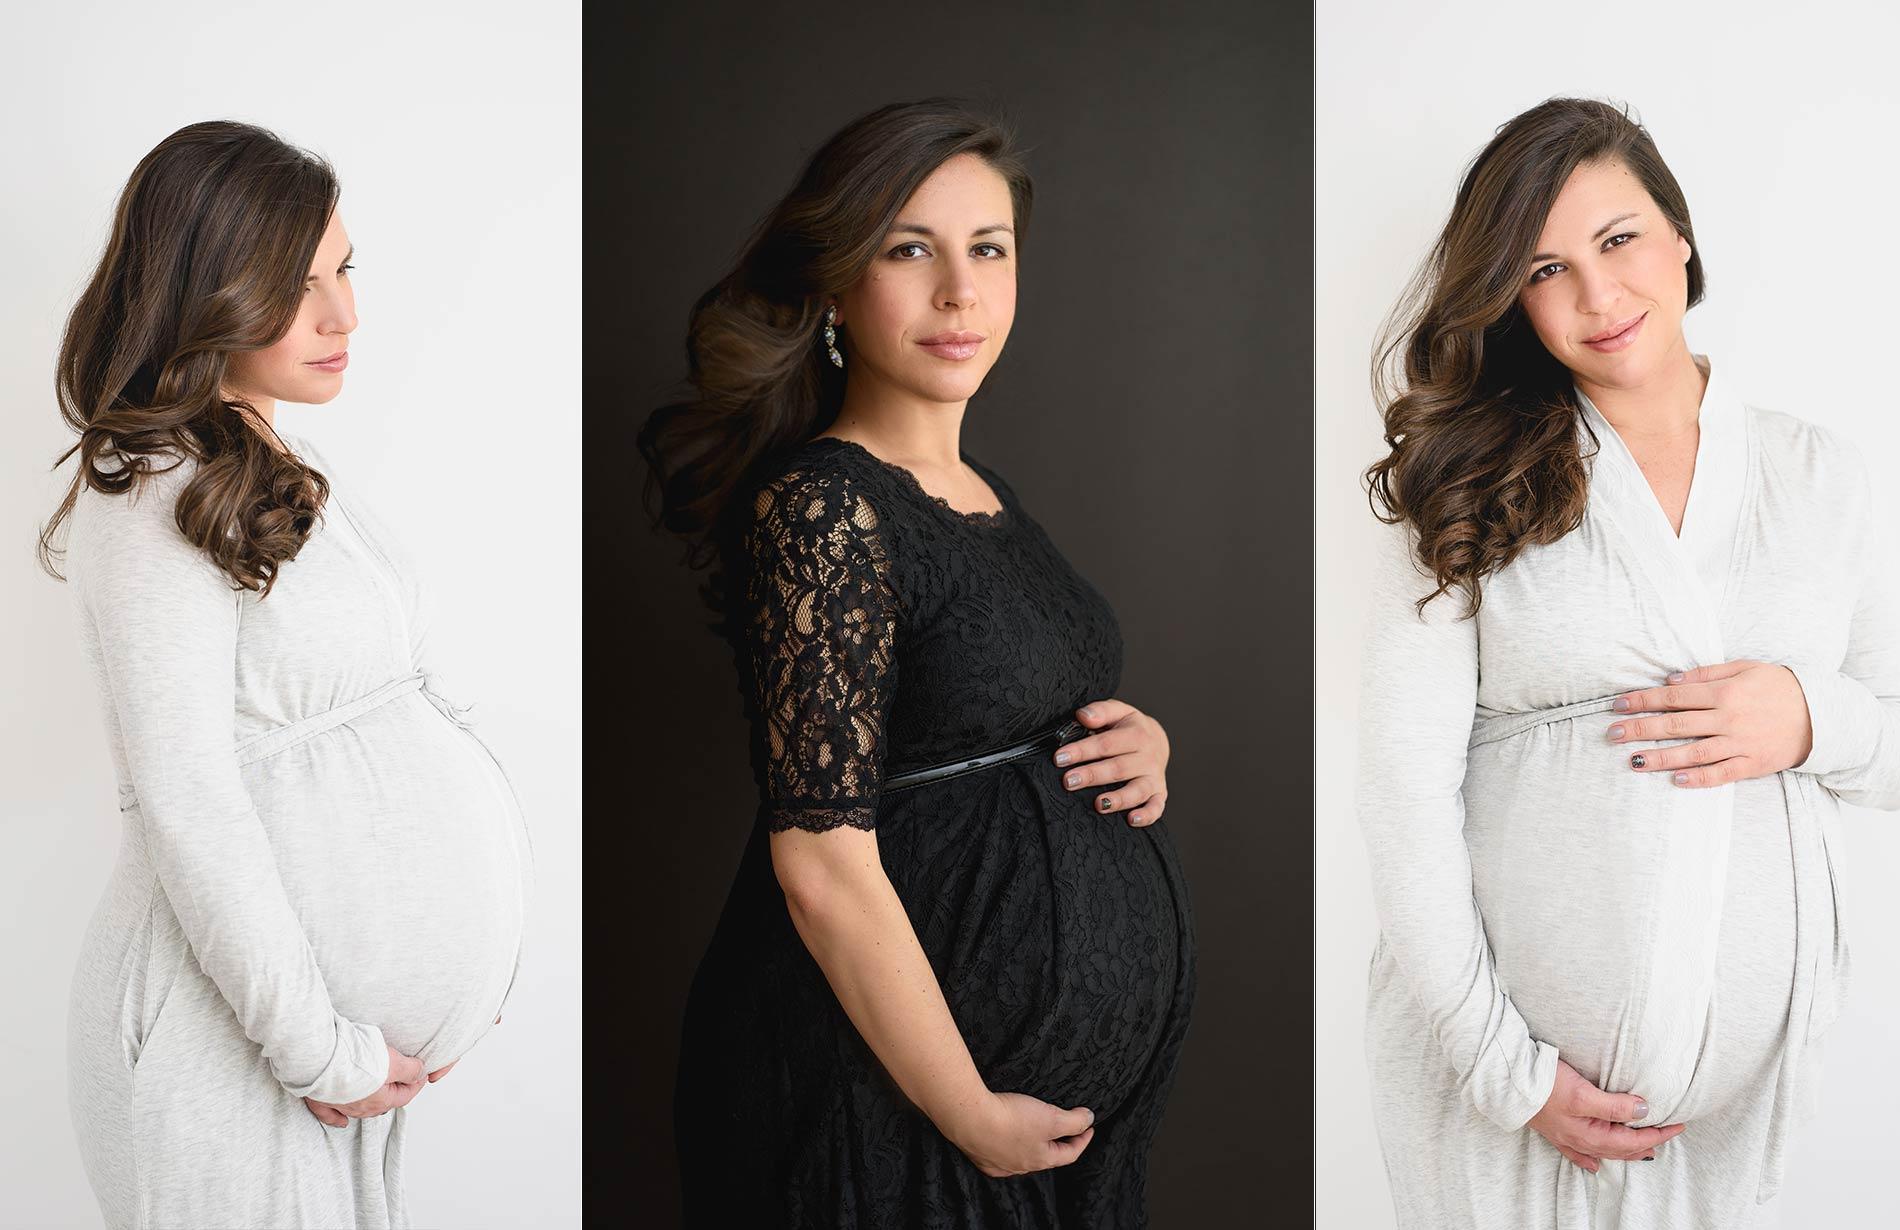 greenwich-ct-maternity-photographer-studio-photography-riverside-connecticut.jpg